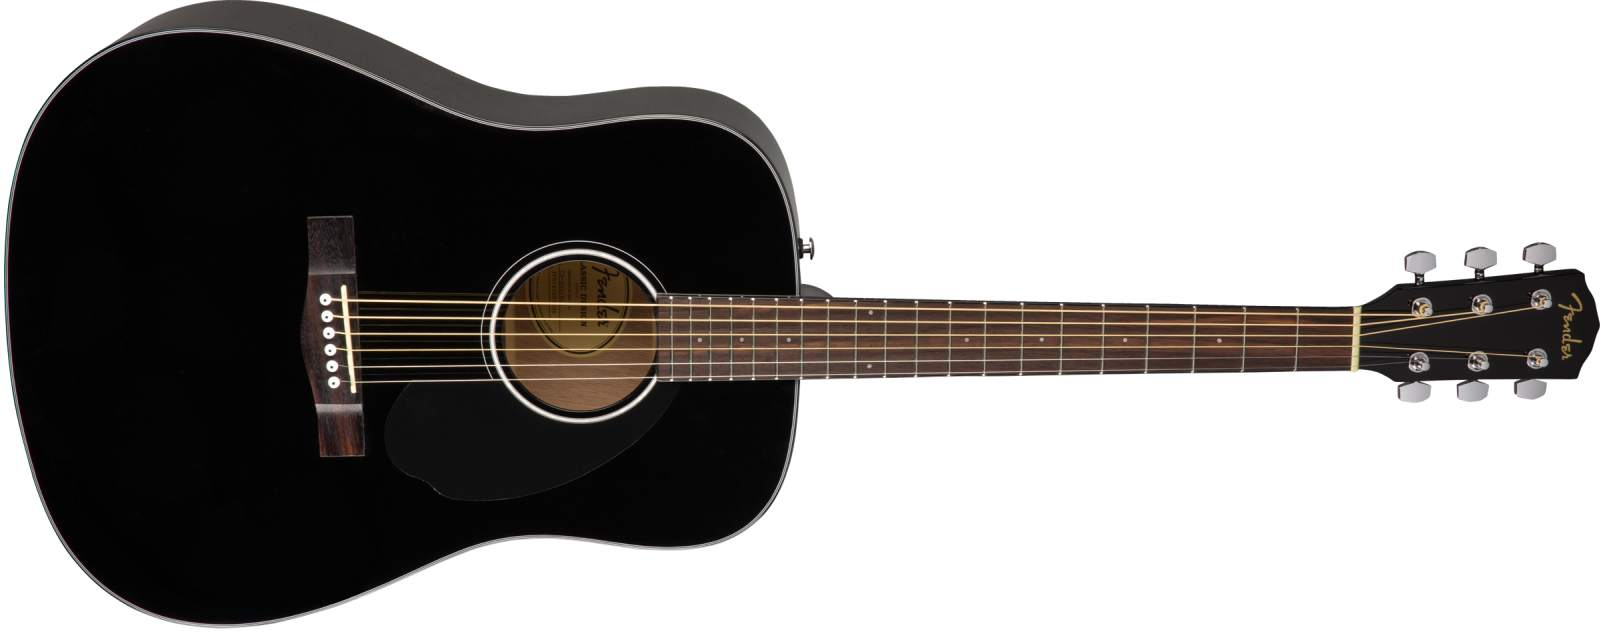 Fender CD-60s BLK Dreadnought